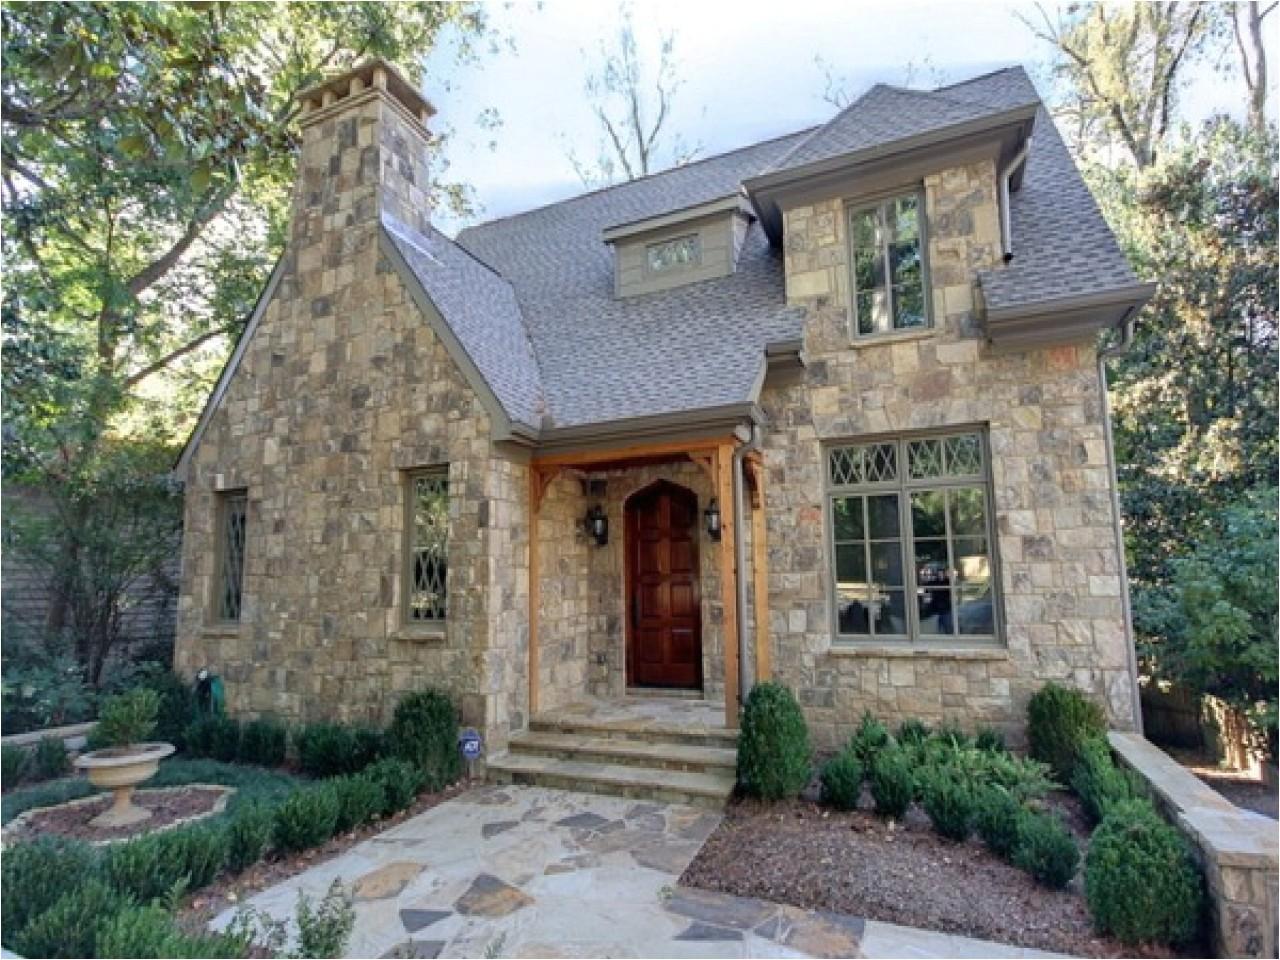 d83f5c62f134d9f7 stone cottage design irish stone cottage house plans